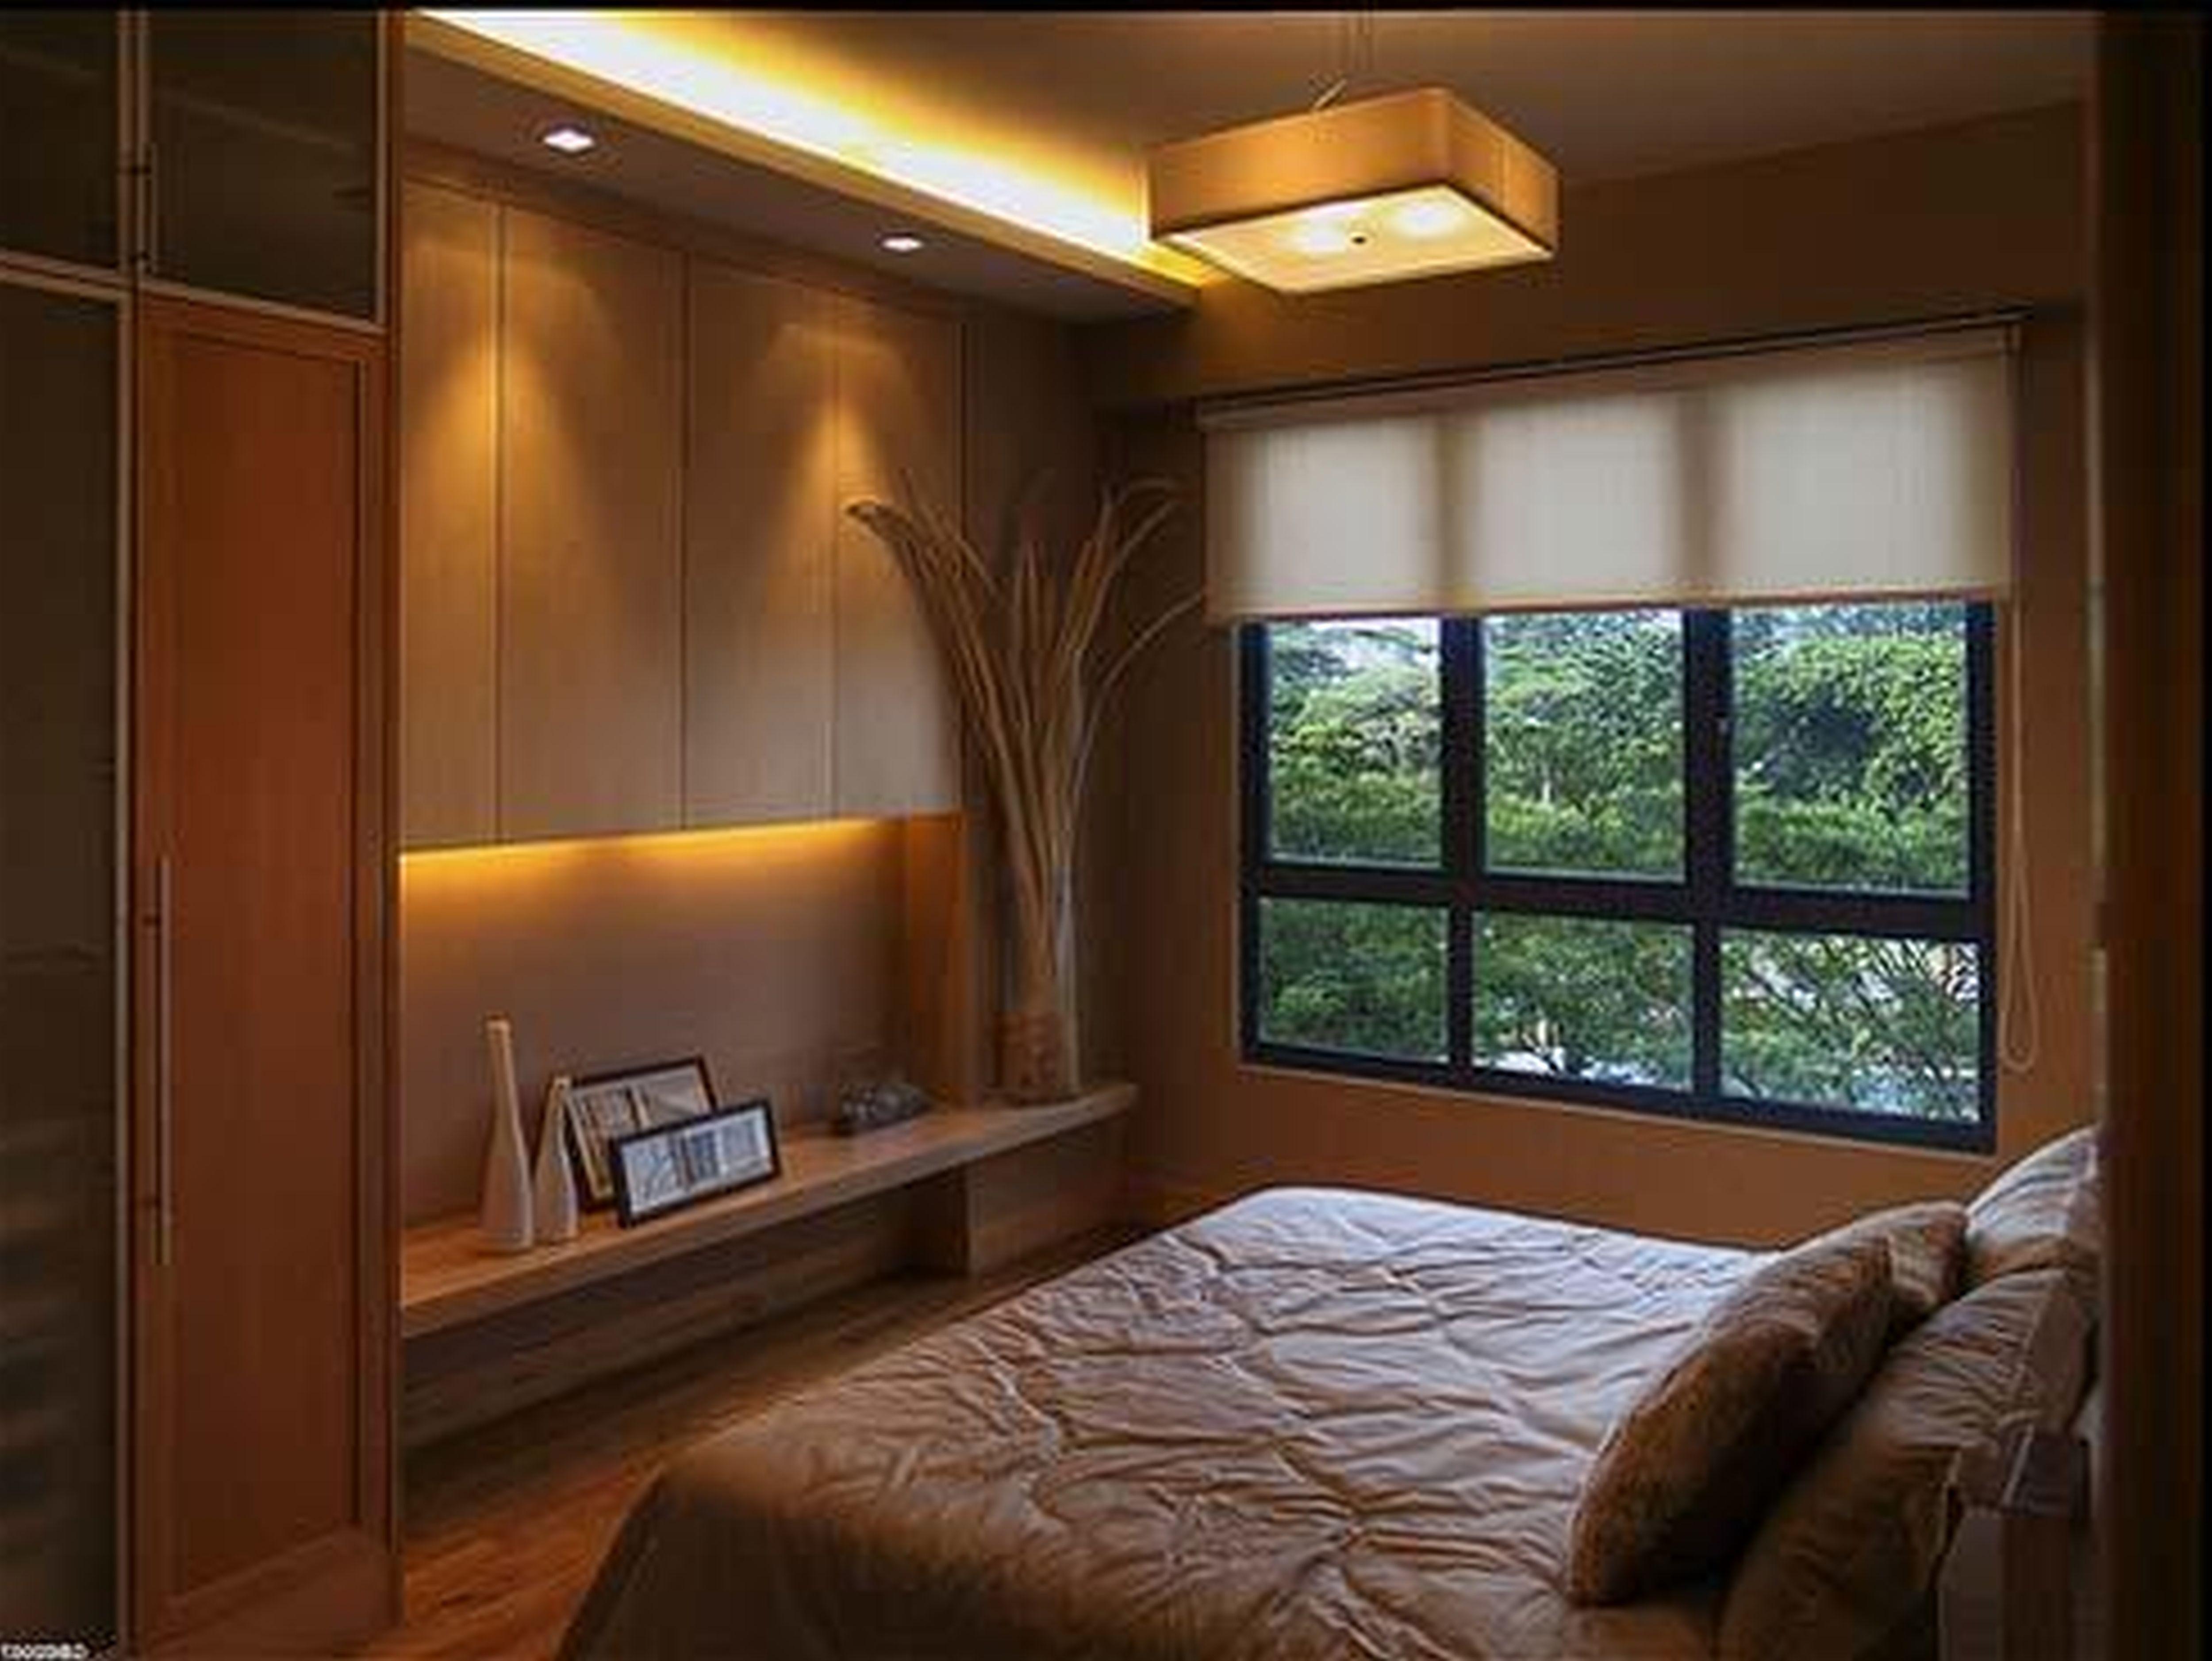 Small Bedroom Furniture Design Ideas  Small Bedroom  Pinterest Cool Interior Design Small Bedroom Ideas Inspiration